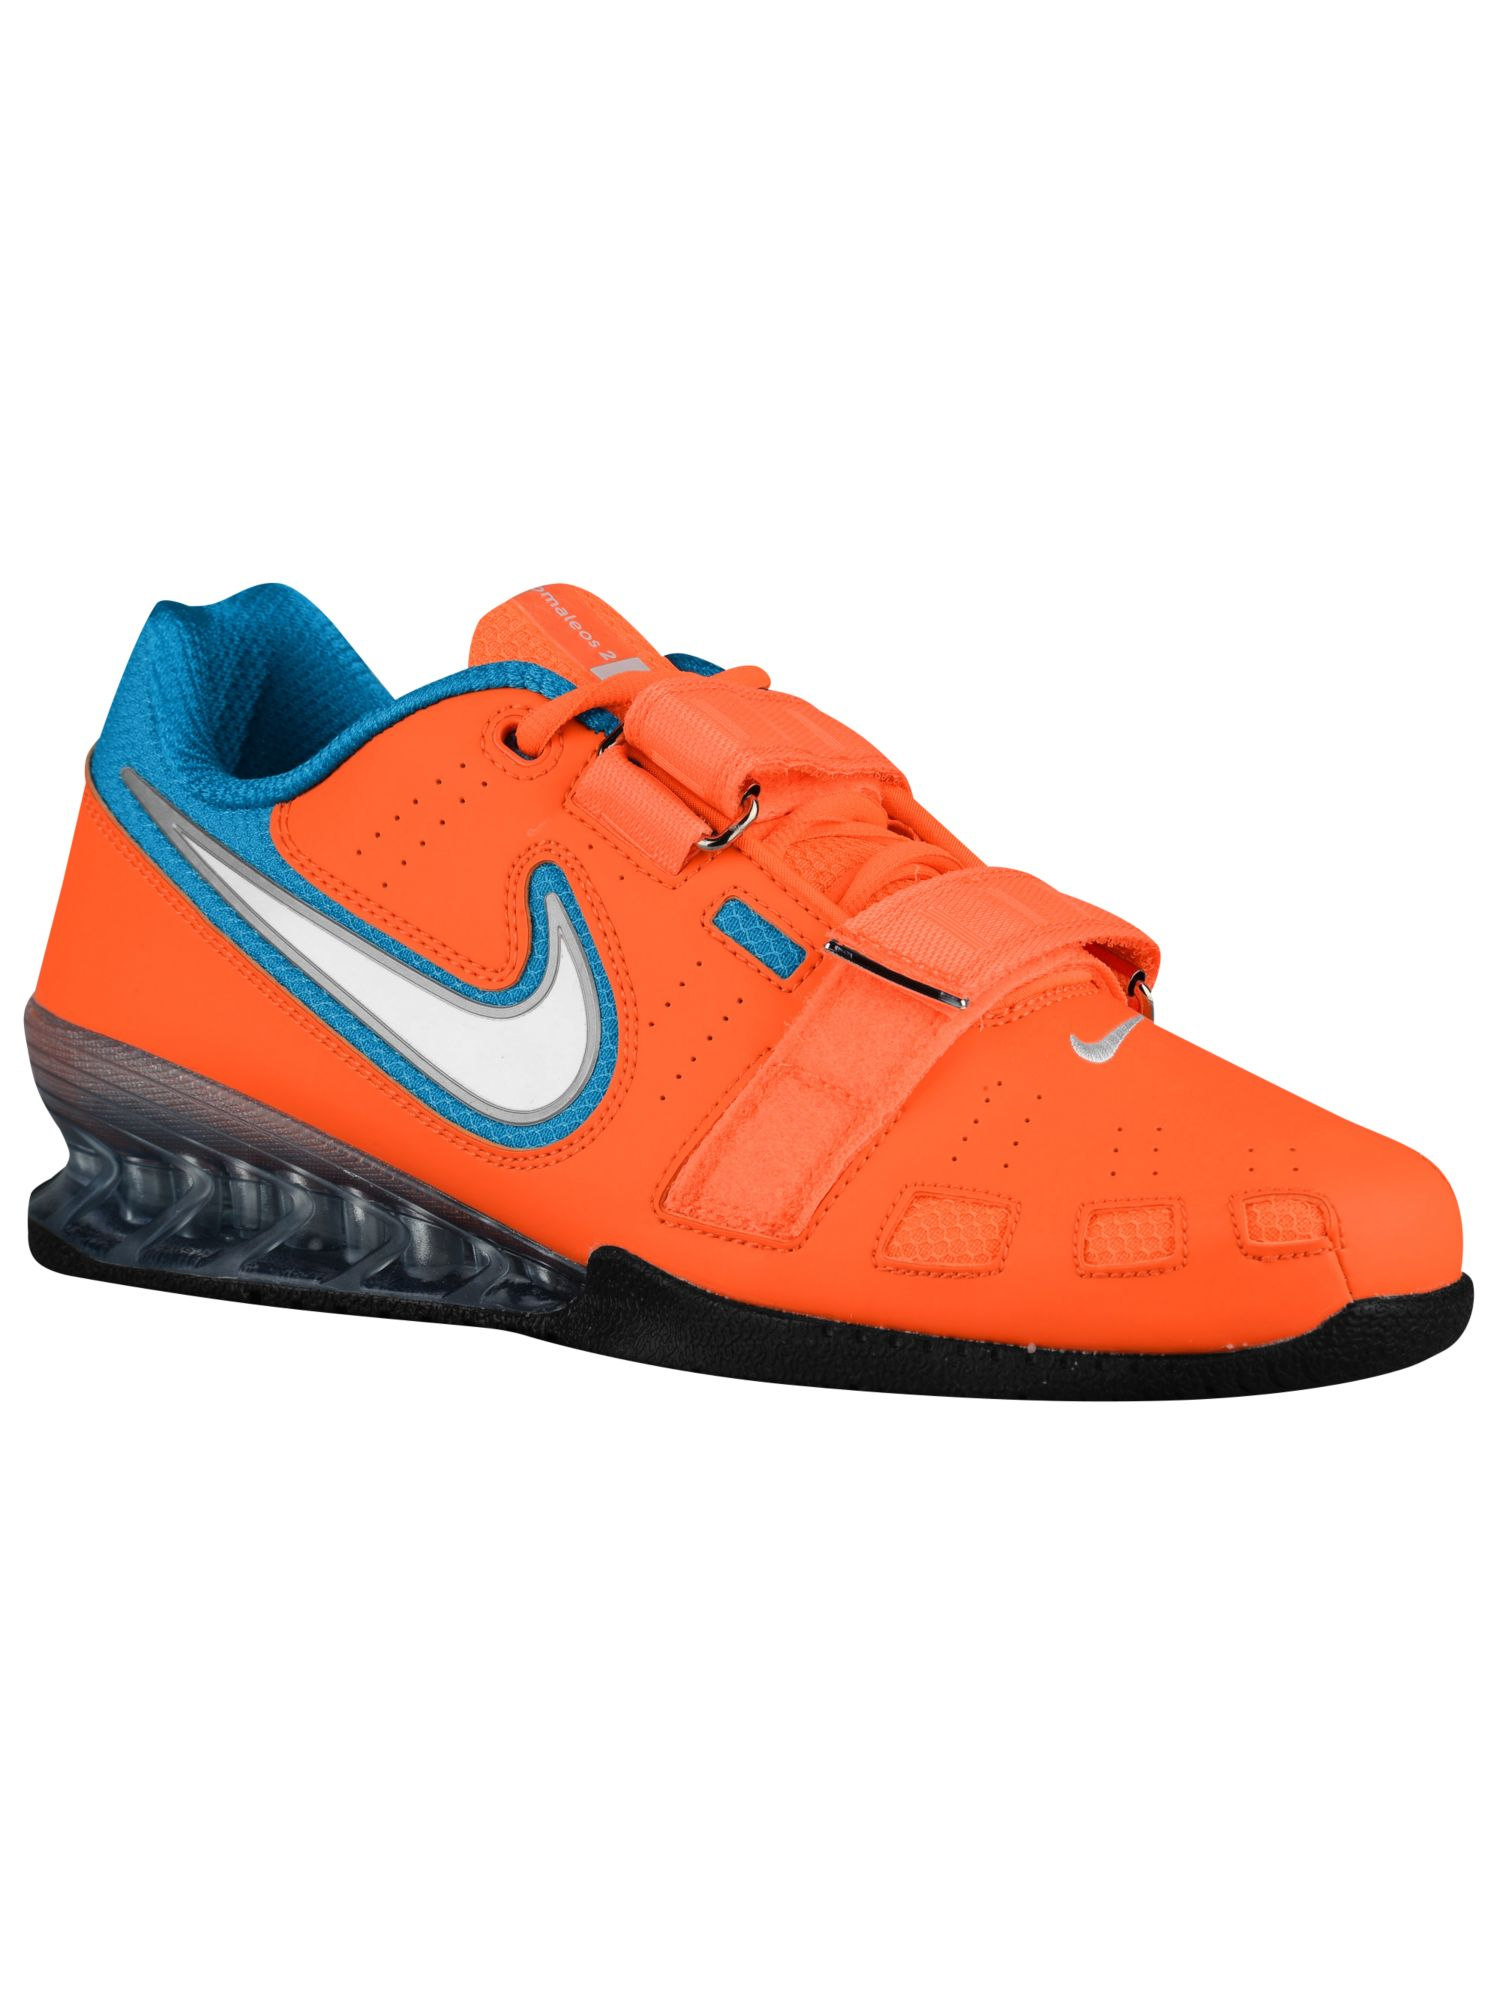 8da0b8aa103a ... coupon code for nike romaleos ii power lifting mens training shoes  total orange white blue lagoon ...